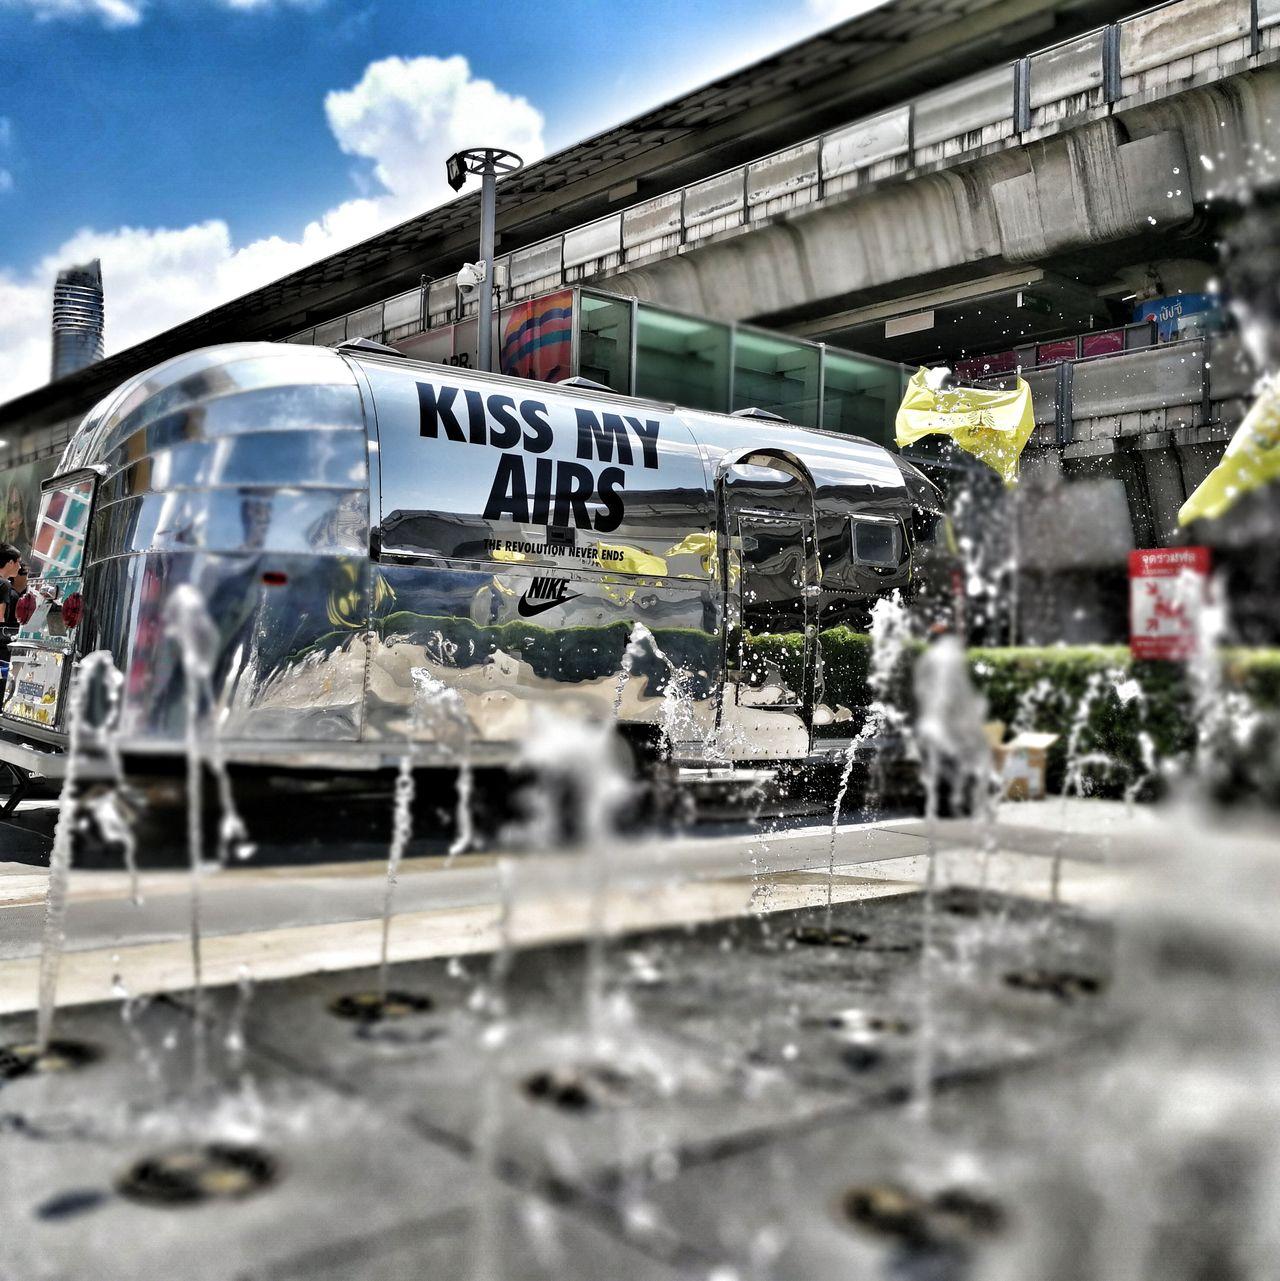 Nike Nike✔ Airmax Kissmyairs Bangkok Streetphotography EyeEm Best Shots EyeEm Travel Photography Huawei Huawei Mate 9 Leica Thailand